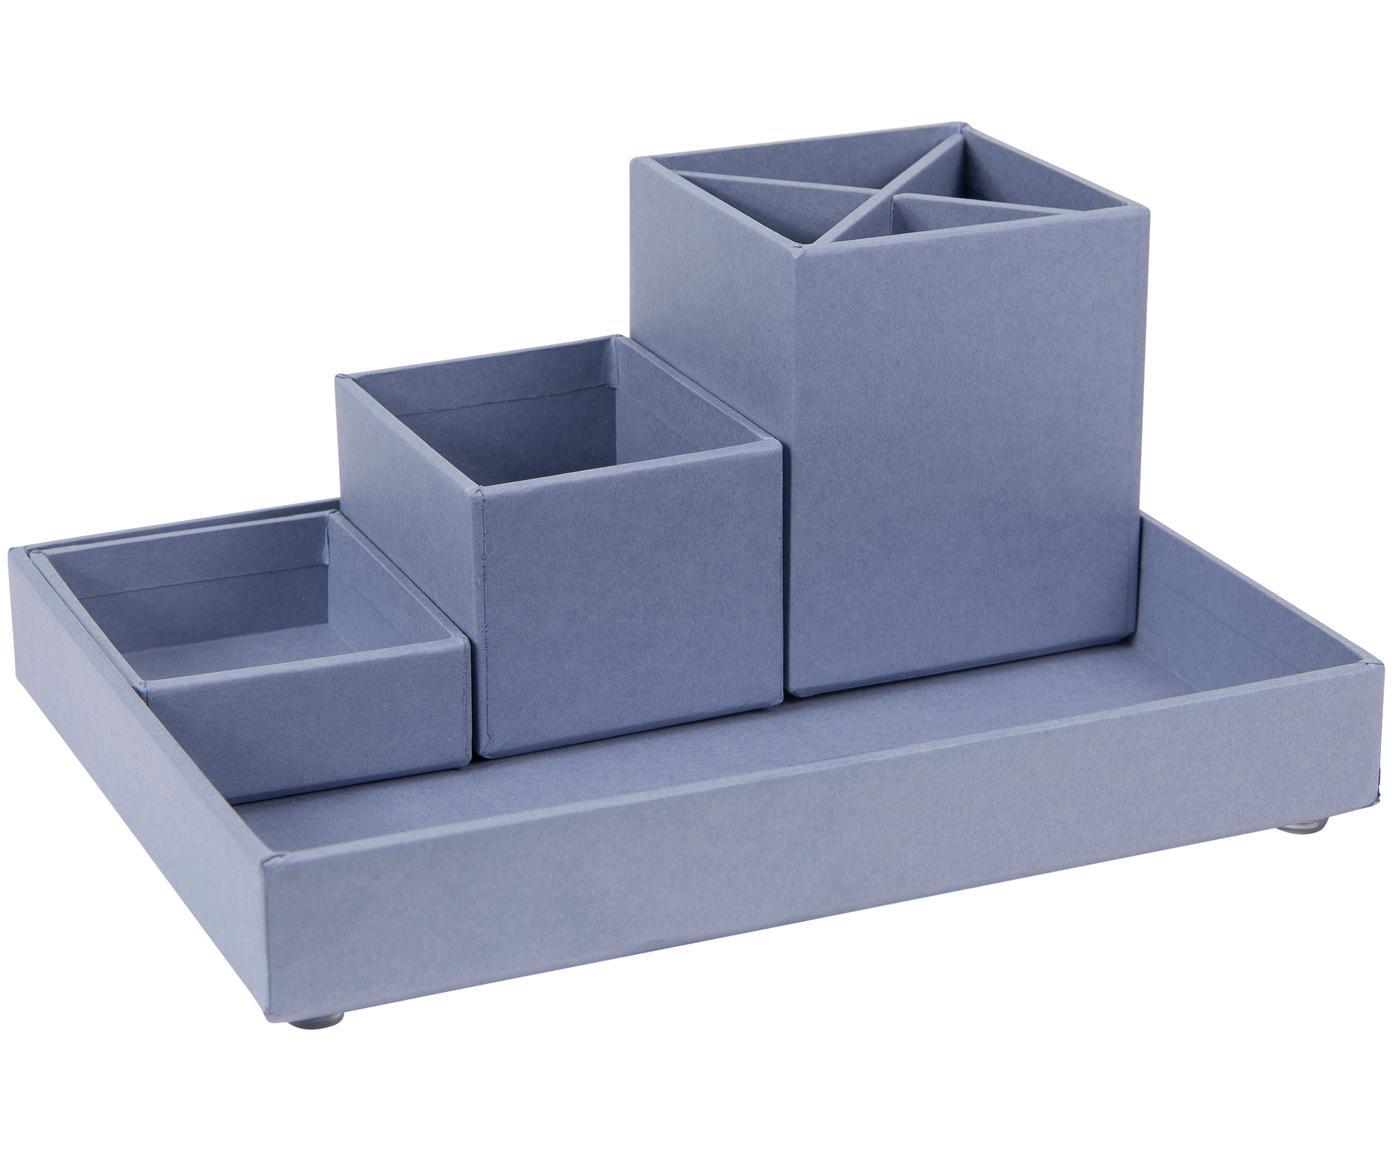 Büro-Organizer-Set Lena, 4-tlg., Fester, laminierter Karton, Taubenblau, Sondergrößen